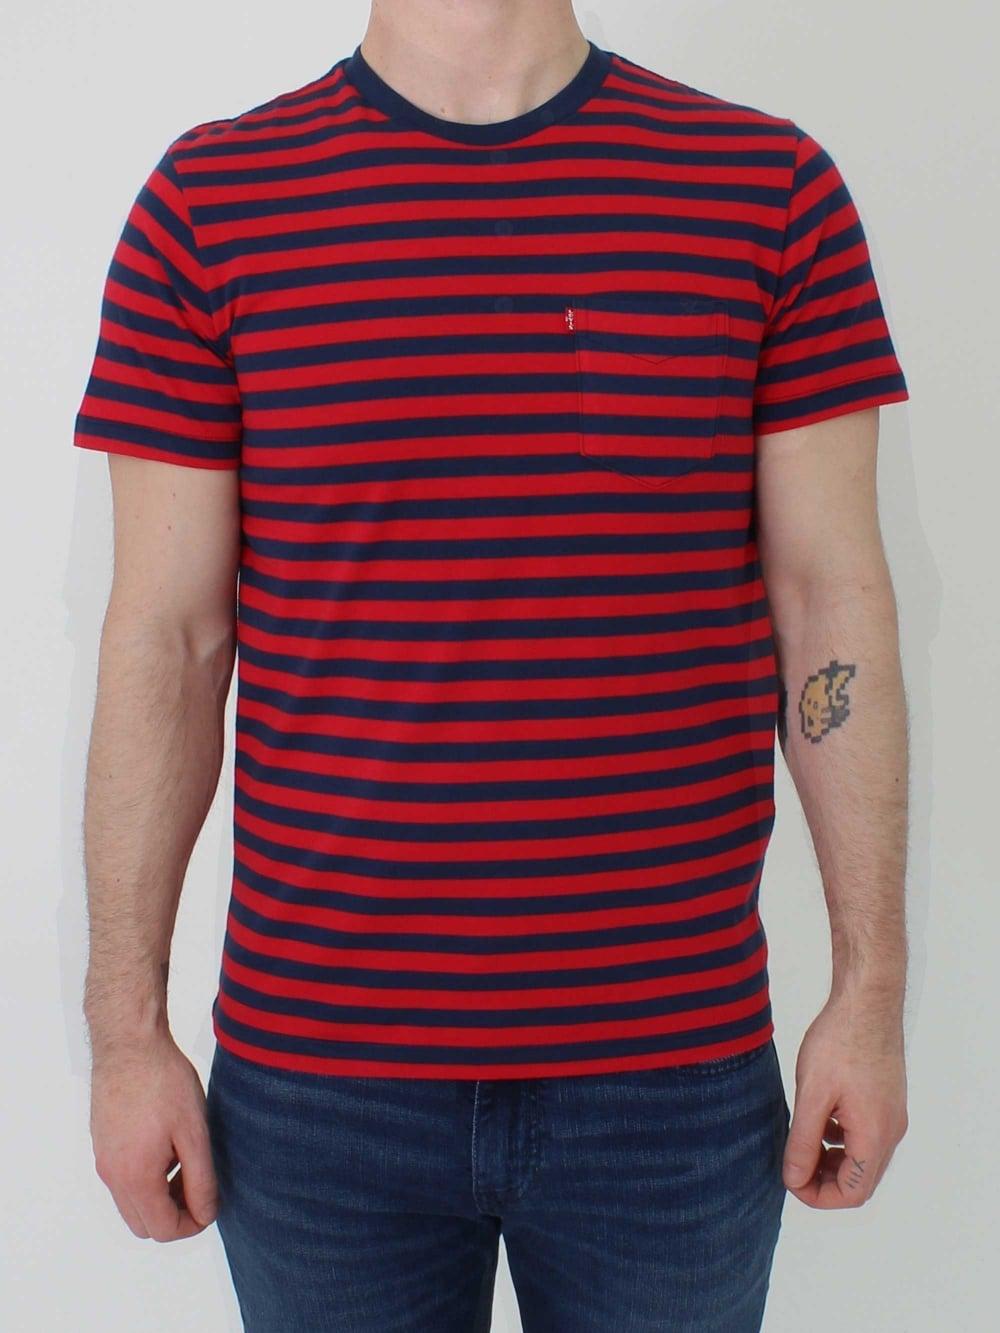 Sunset Shirt T Design Database Levis One Pocket True Blue 65824 0337 In Red Northern Threads